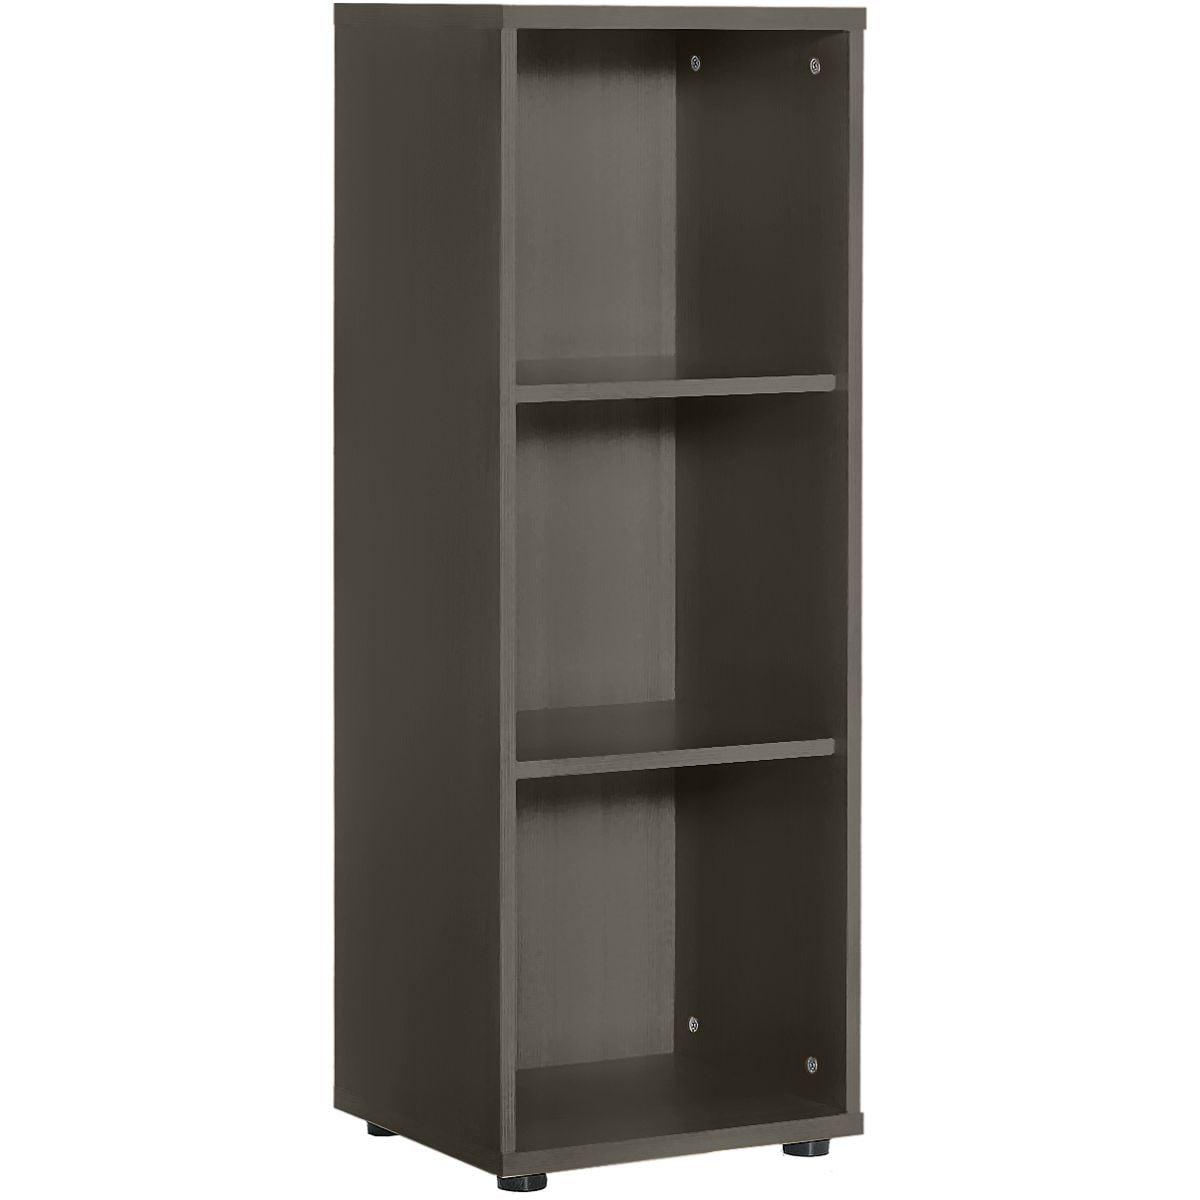 aktenregal riga 40 cm schmal 3 oh bei otto office g nstig kaufen. Black Bedroom Furniture Sets. Home Design Ideas